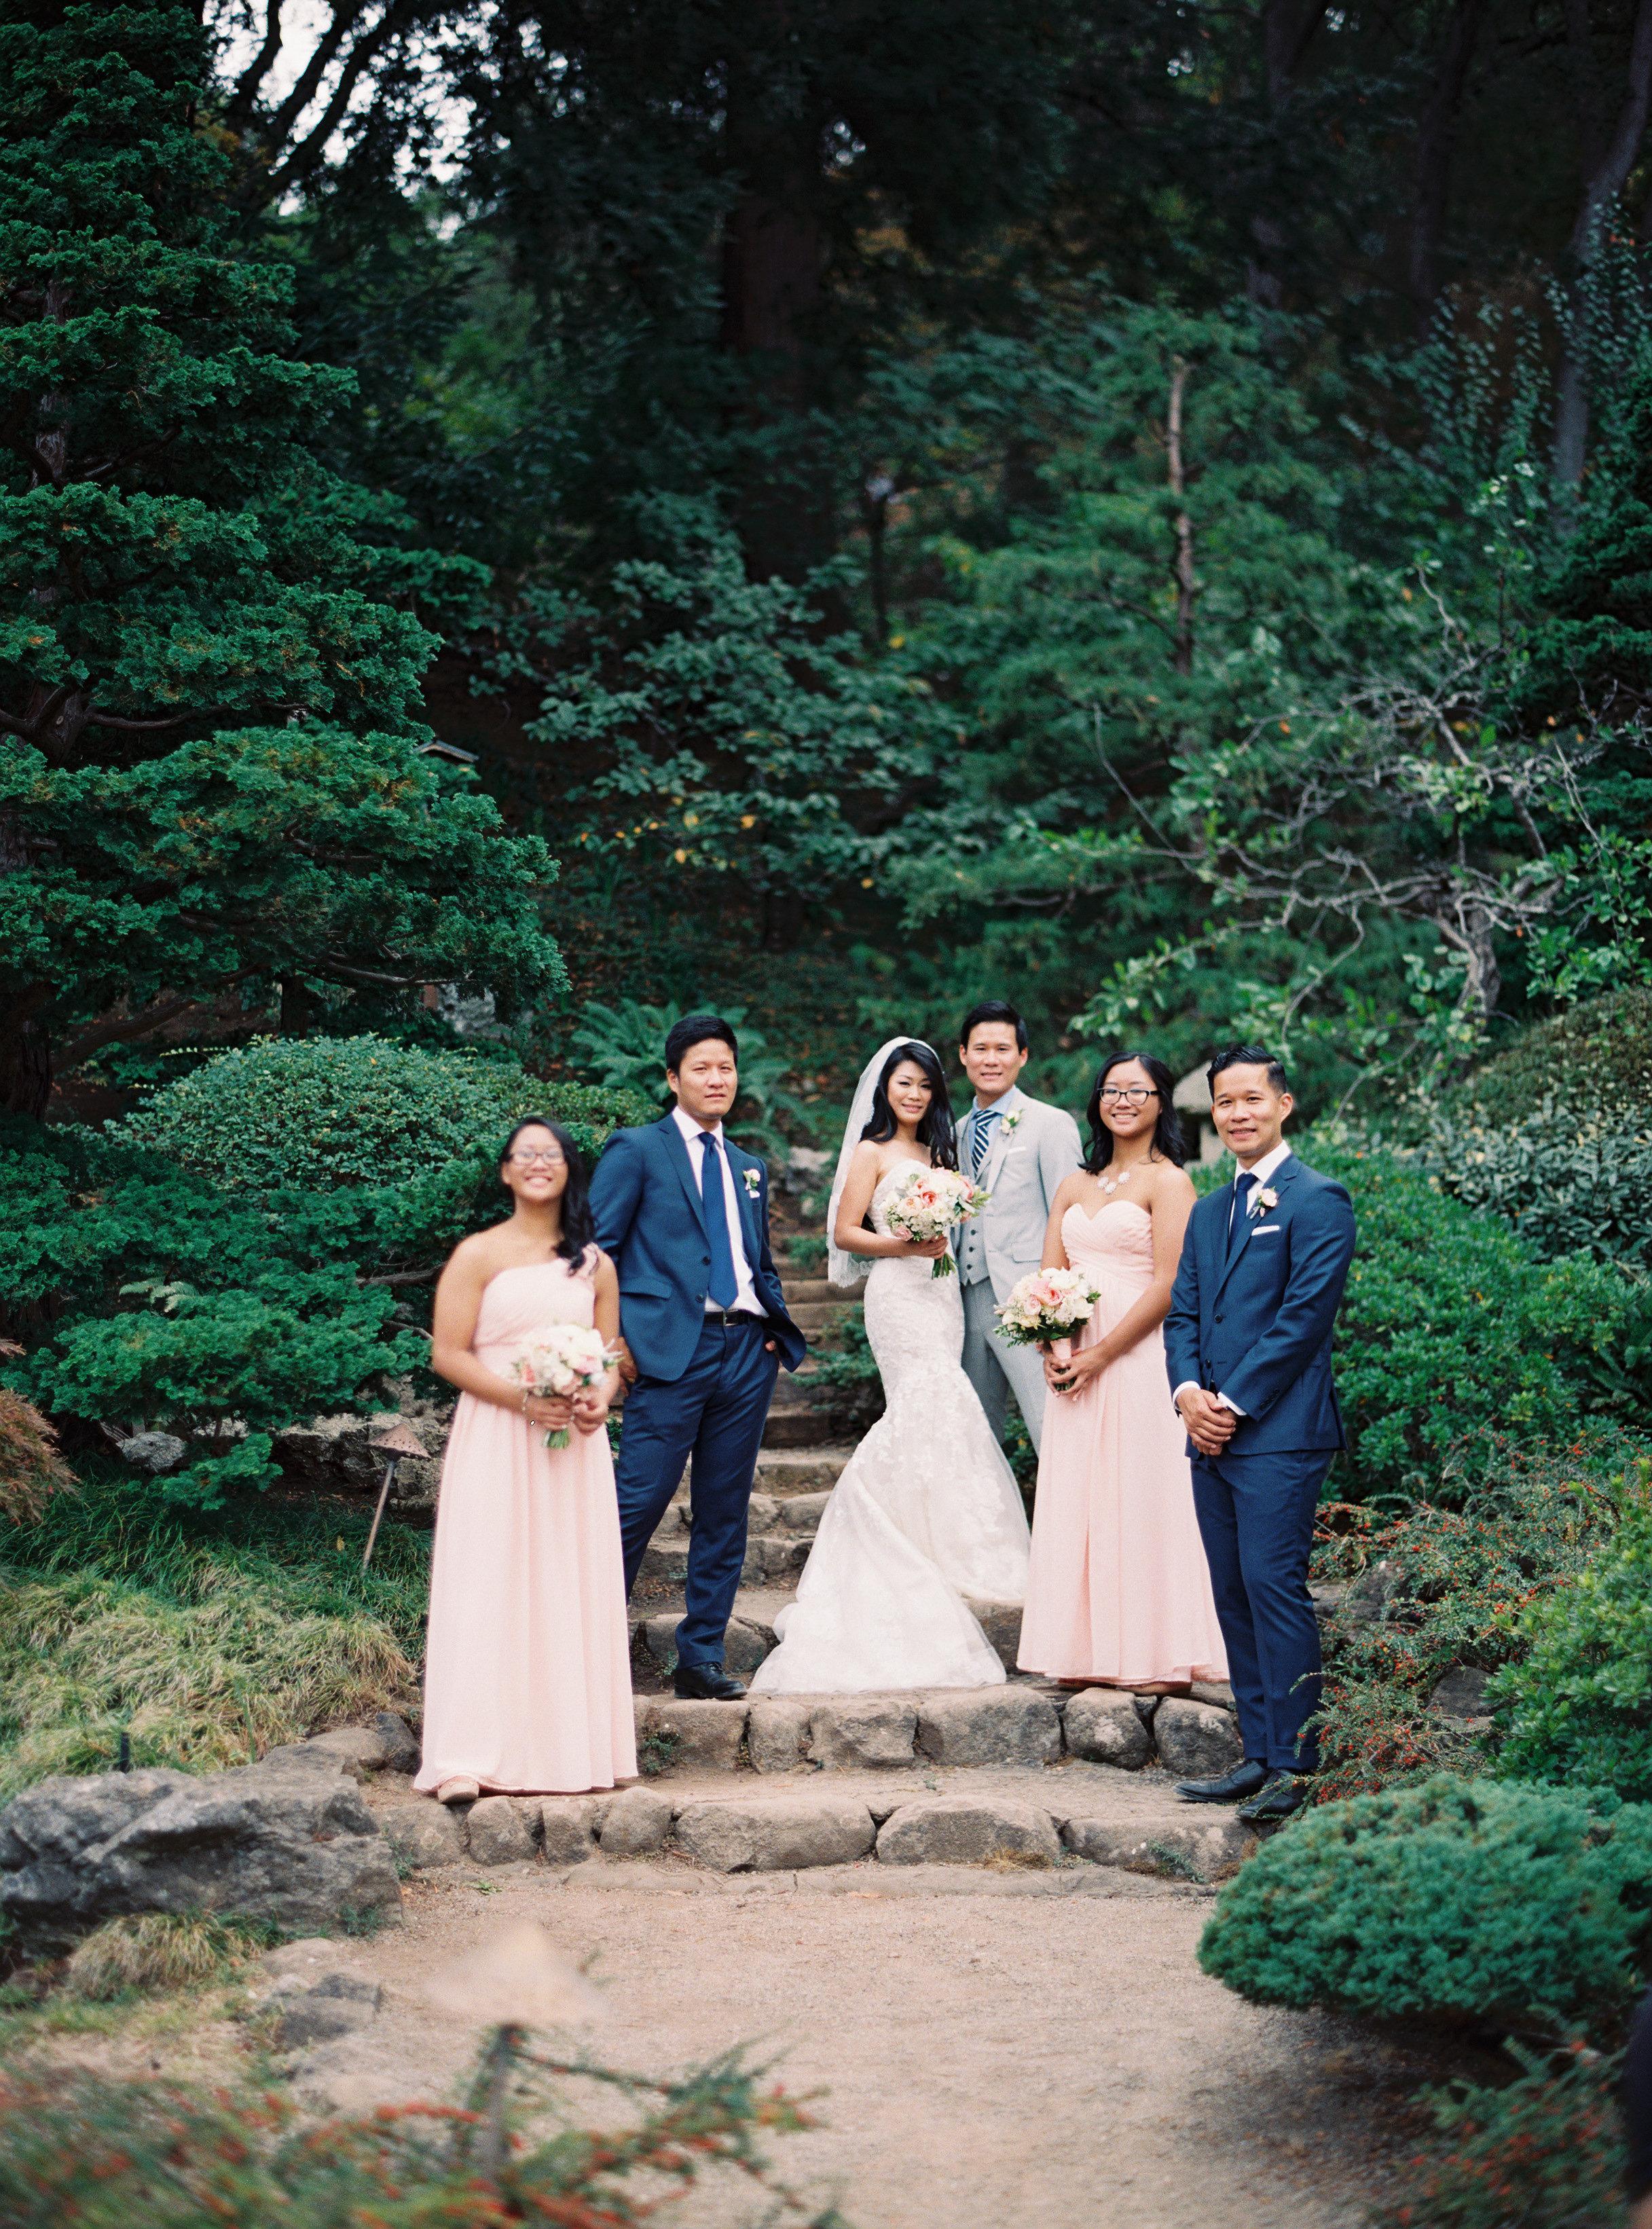 LindaTranPhotography-Flowerstory-Saratoga-wedding-party.jpg